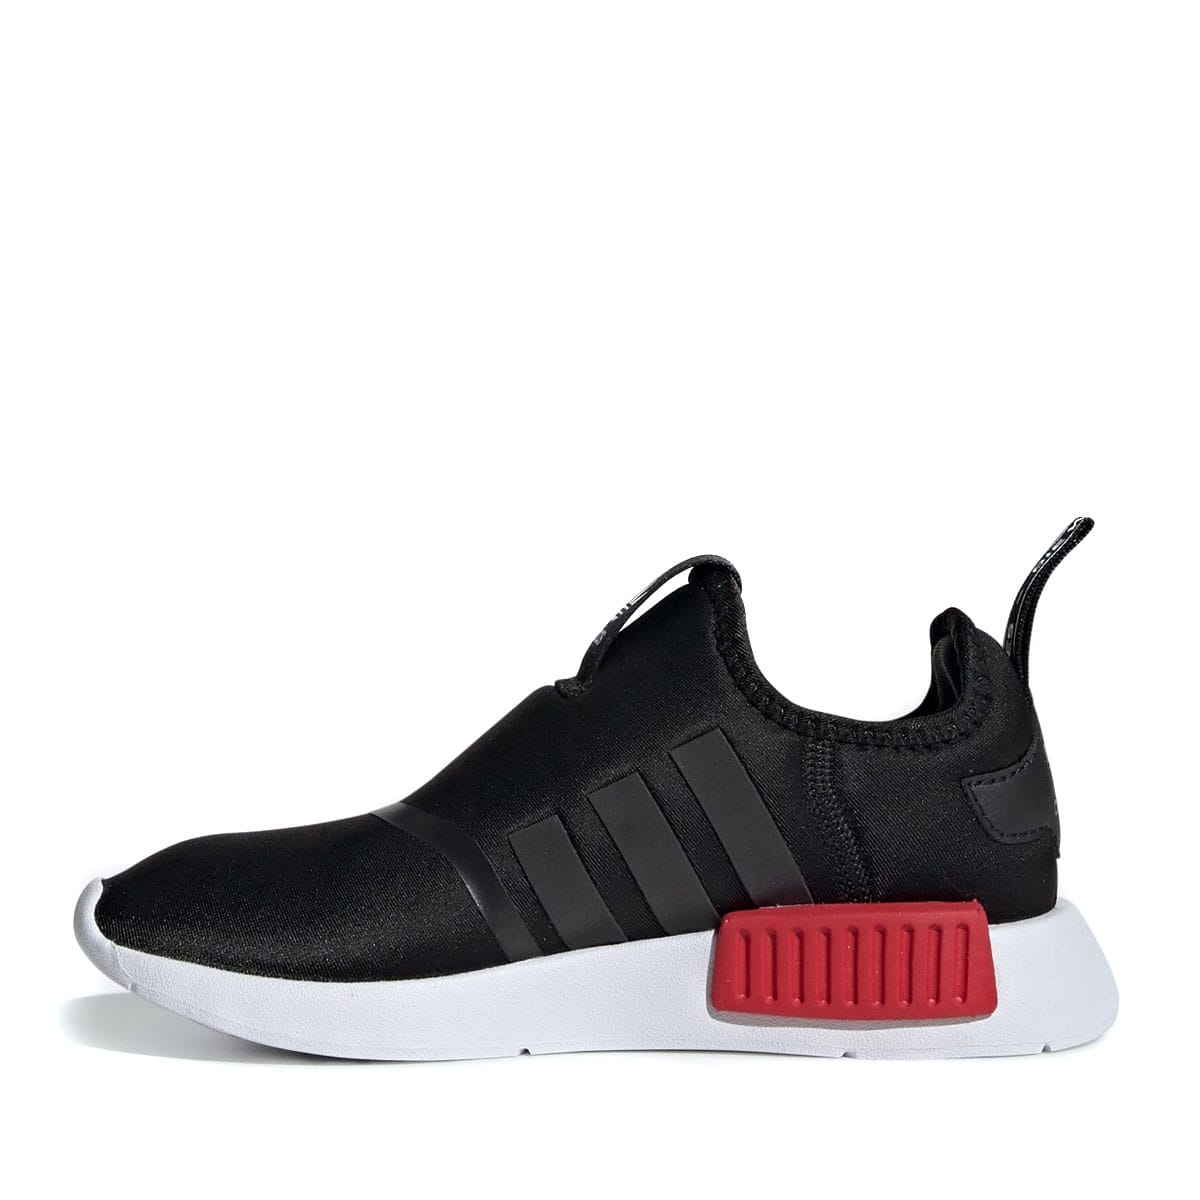 """adidas NMD 360 C CORE BLACK/CORE BLACK/RUNNING WHITE 19FW-I""_photo_2"